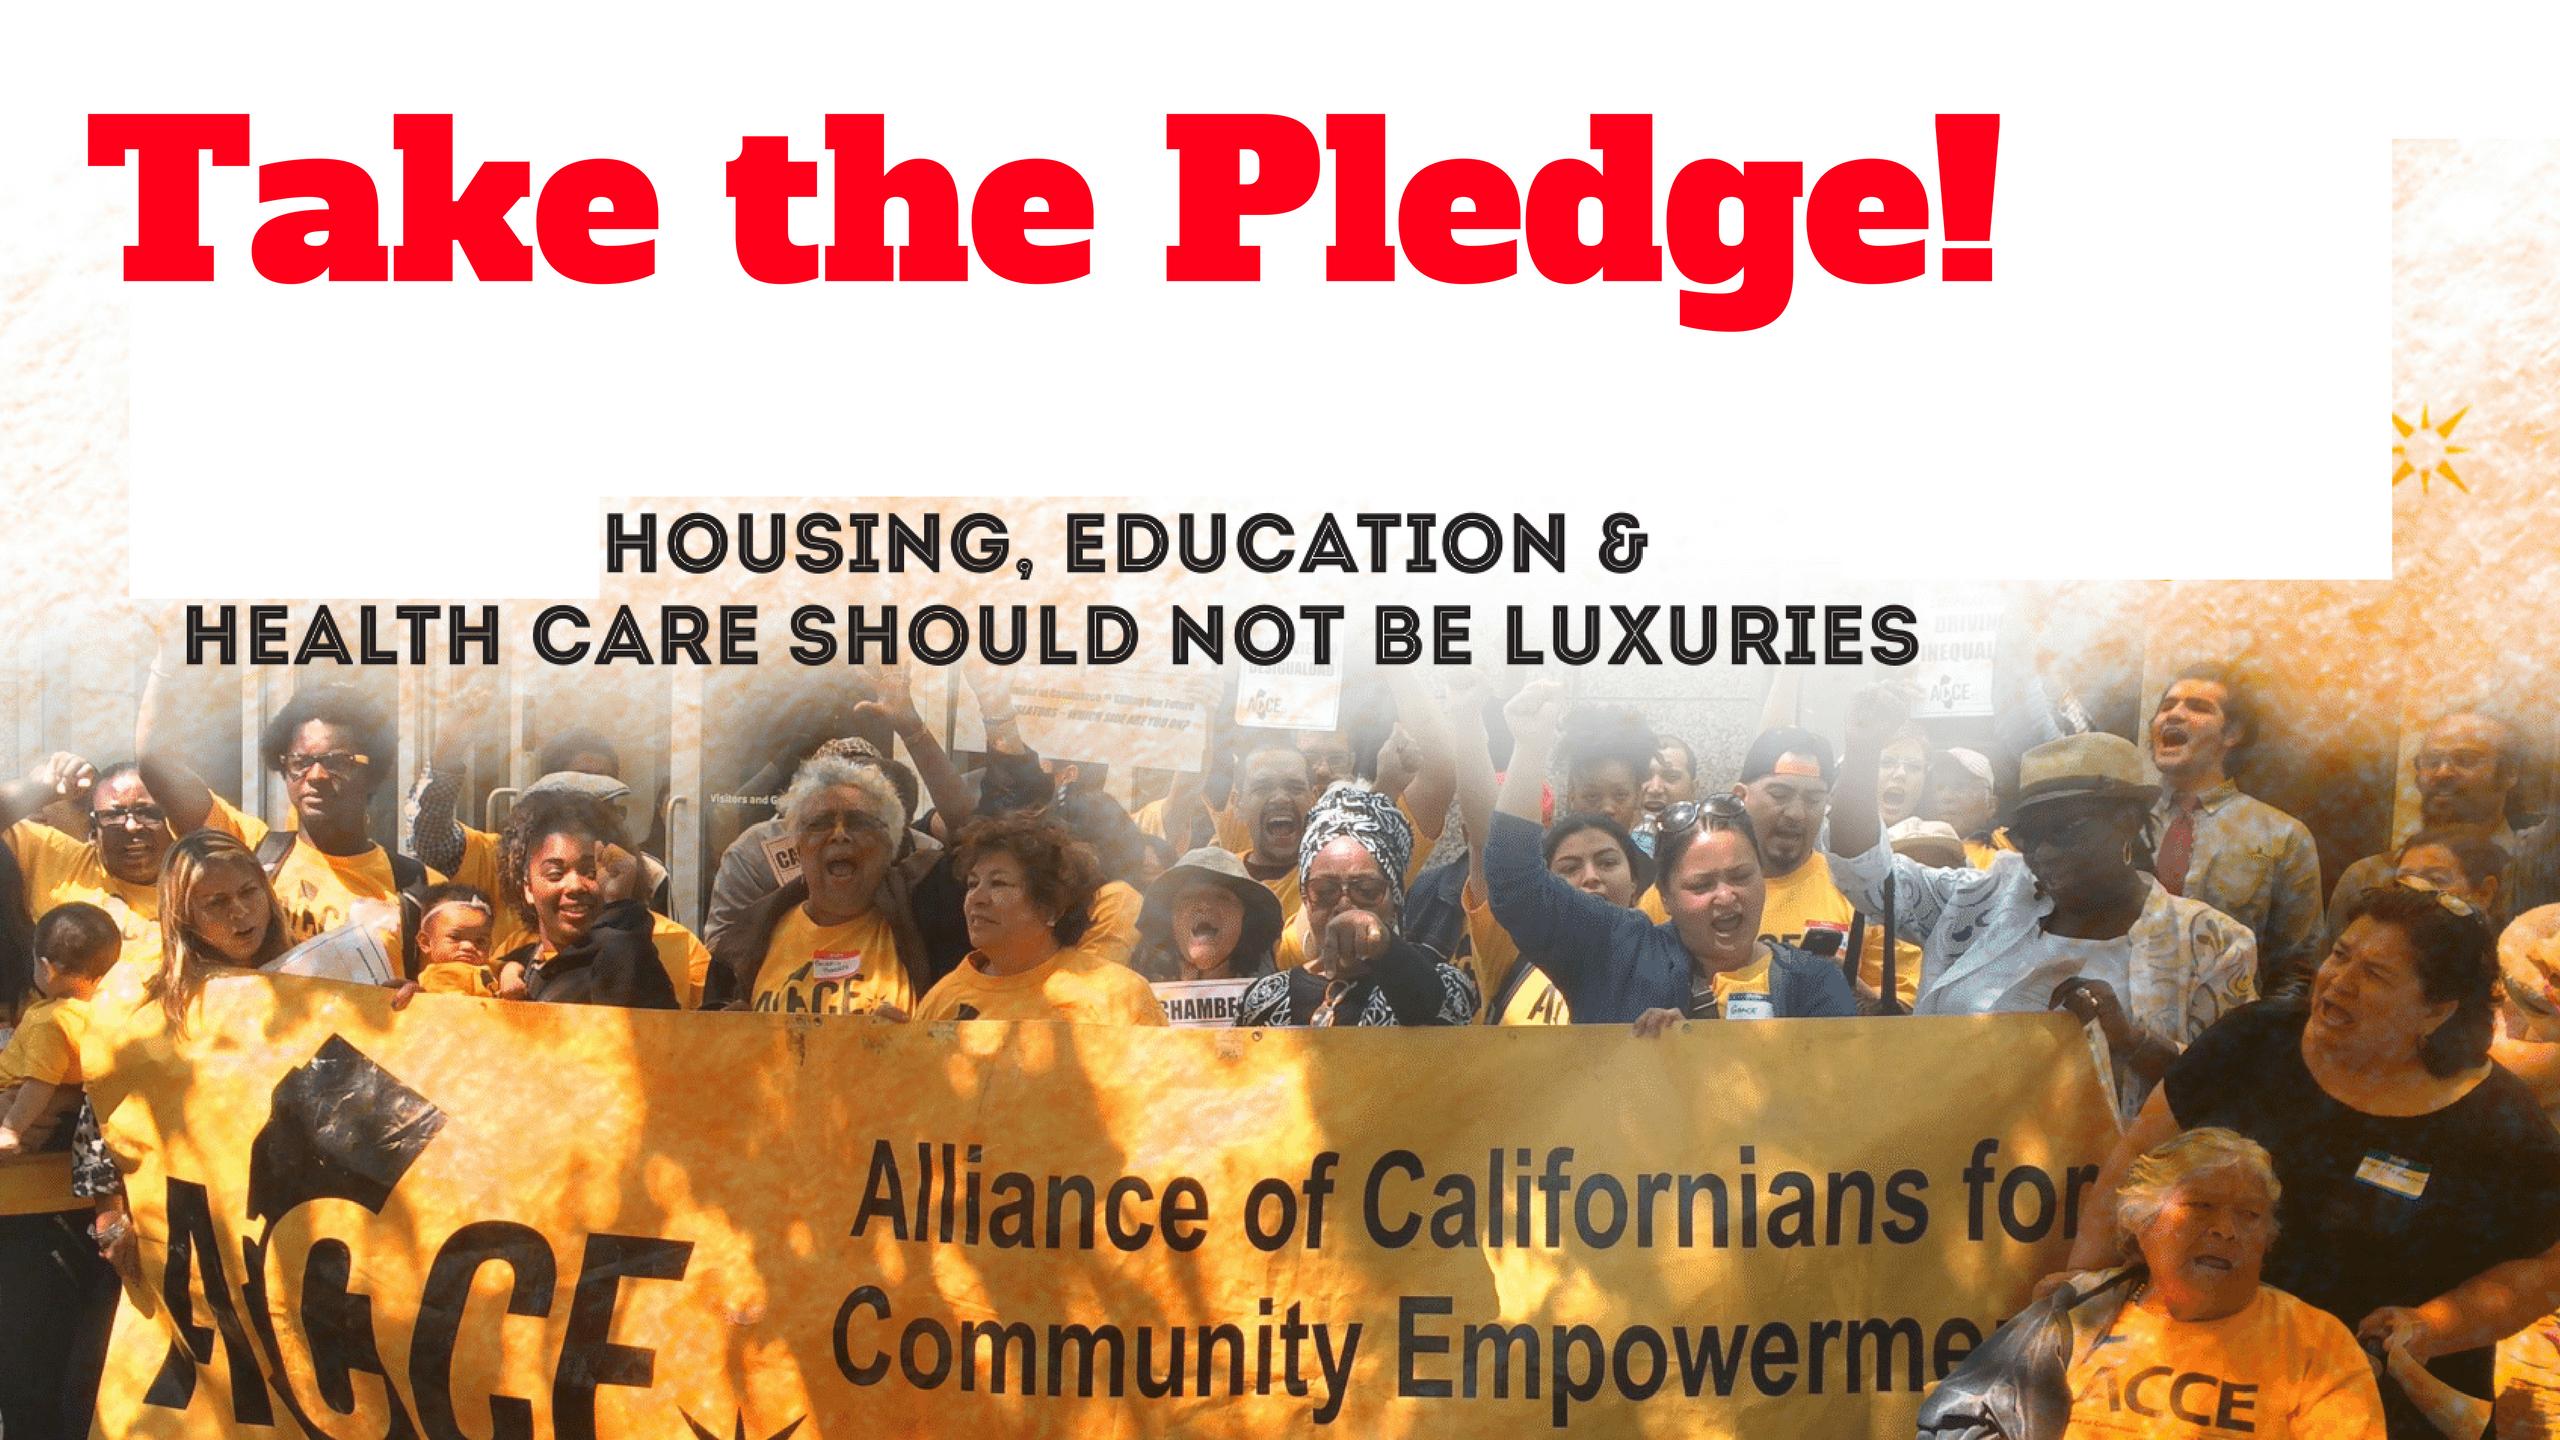 Take_the_Pledge!_(5).png